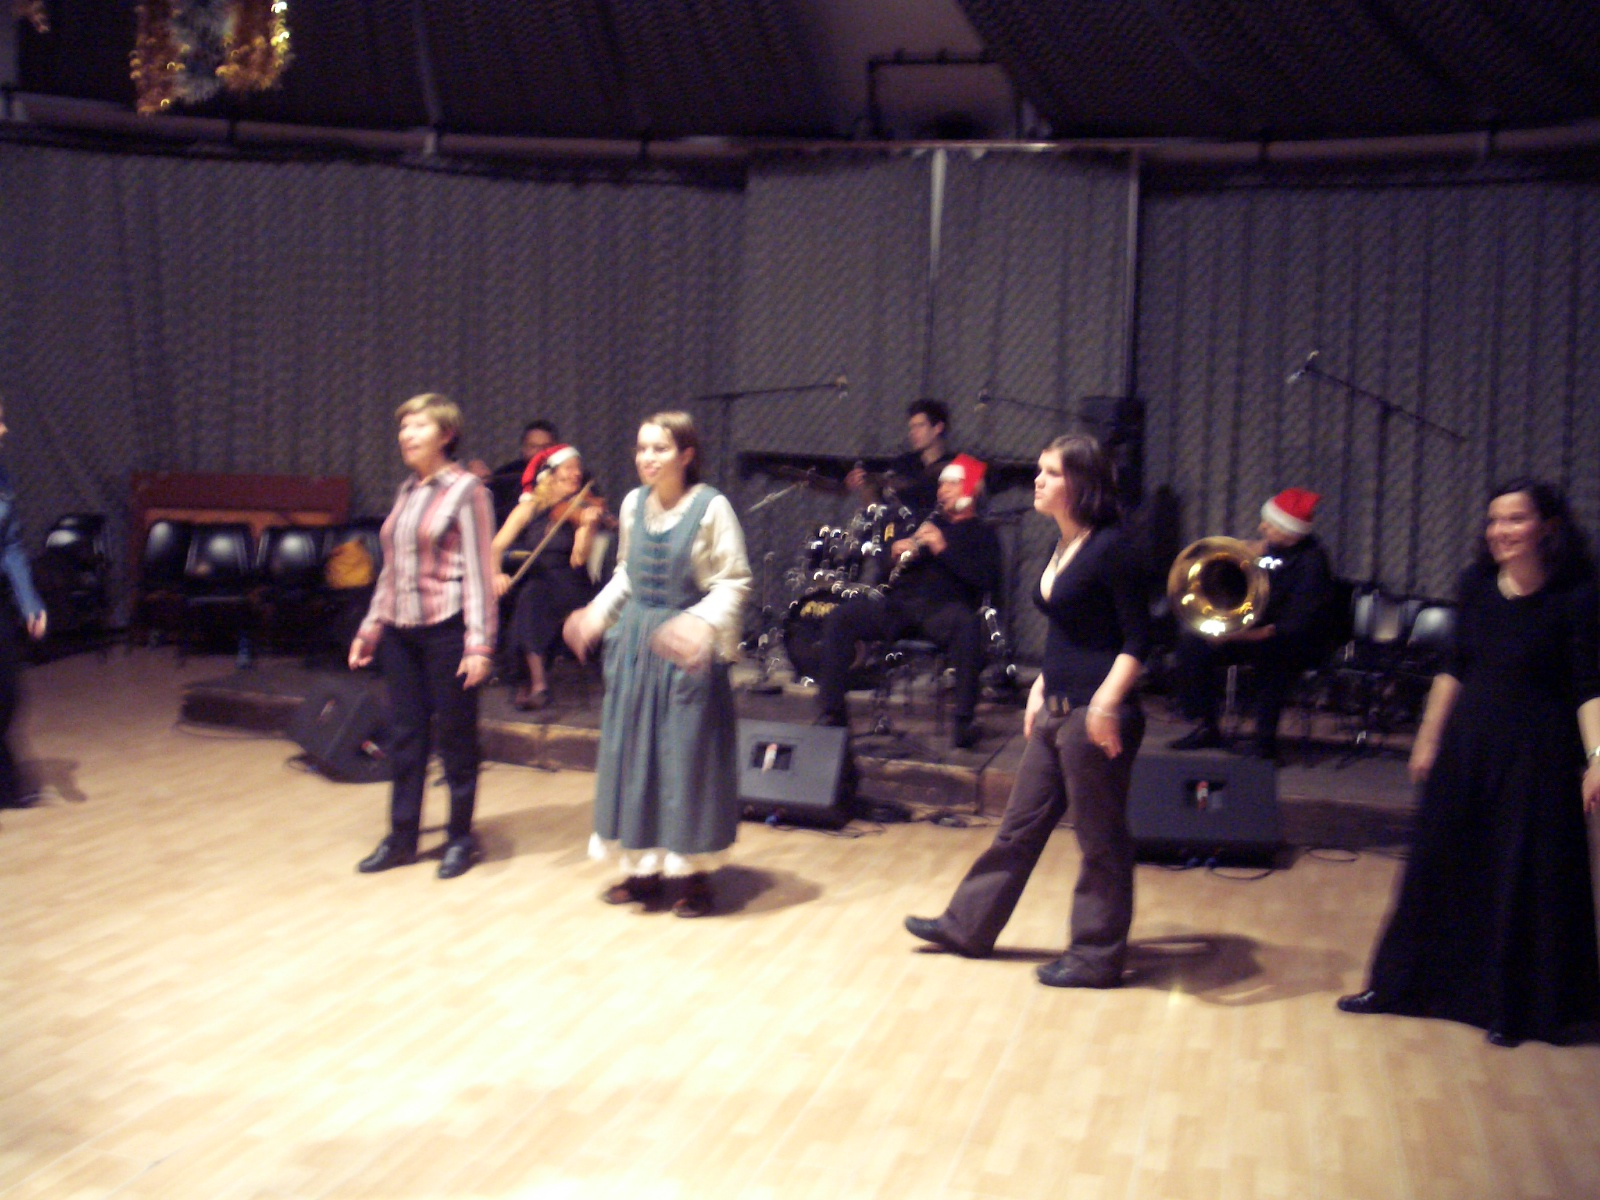 Klezmer dancing in Budapest